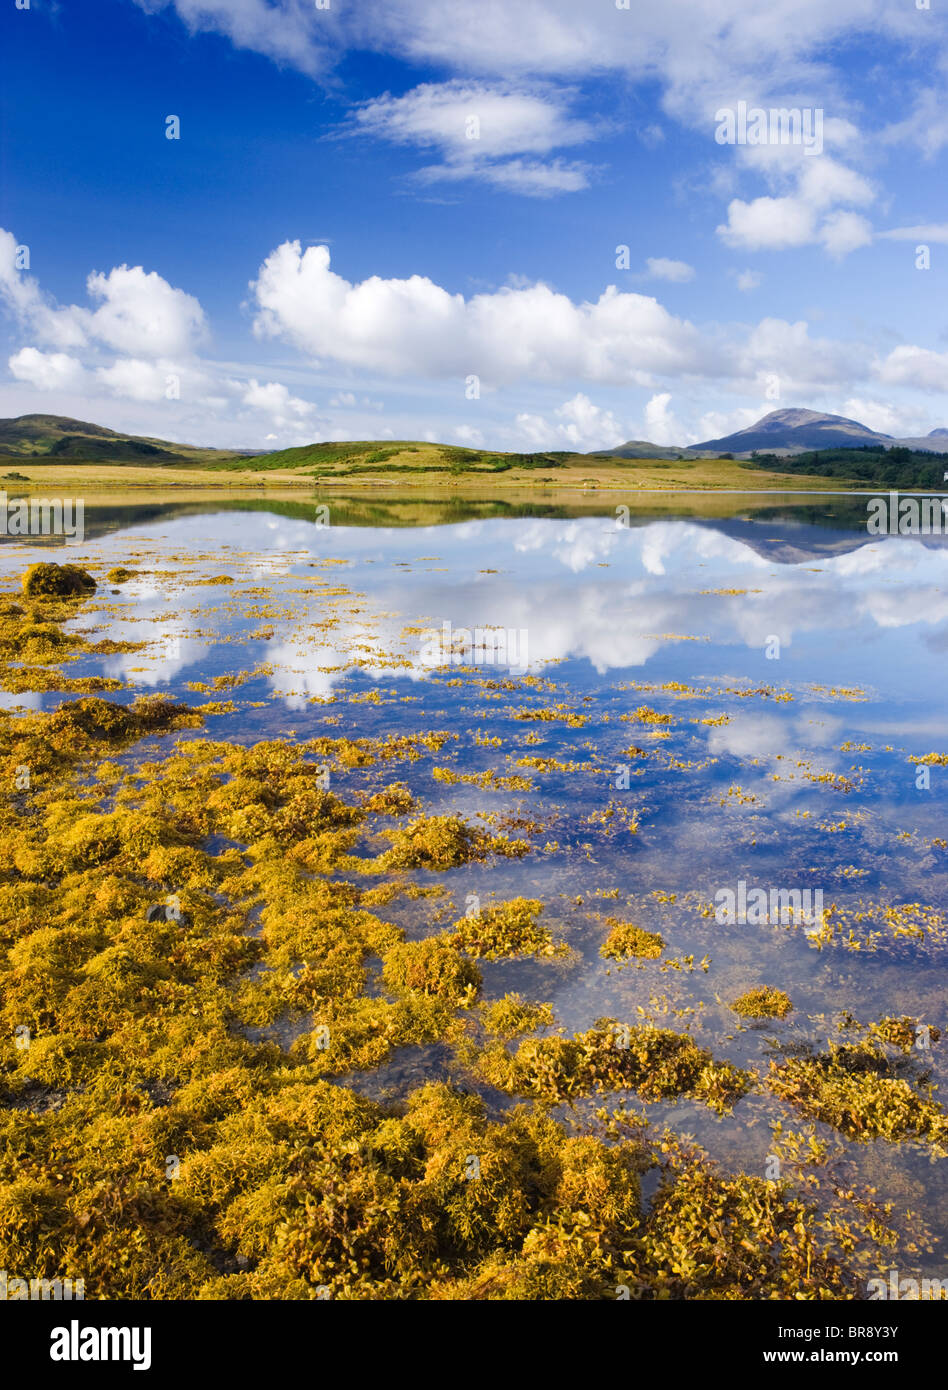 Loch Don, Lochdon, Isle Of Mull, Argyll, Escocia, Reino Unido. Imagen De Stock